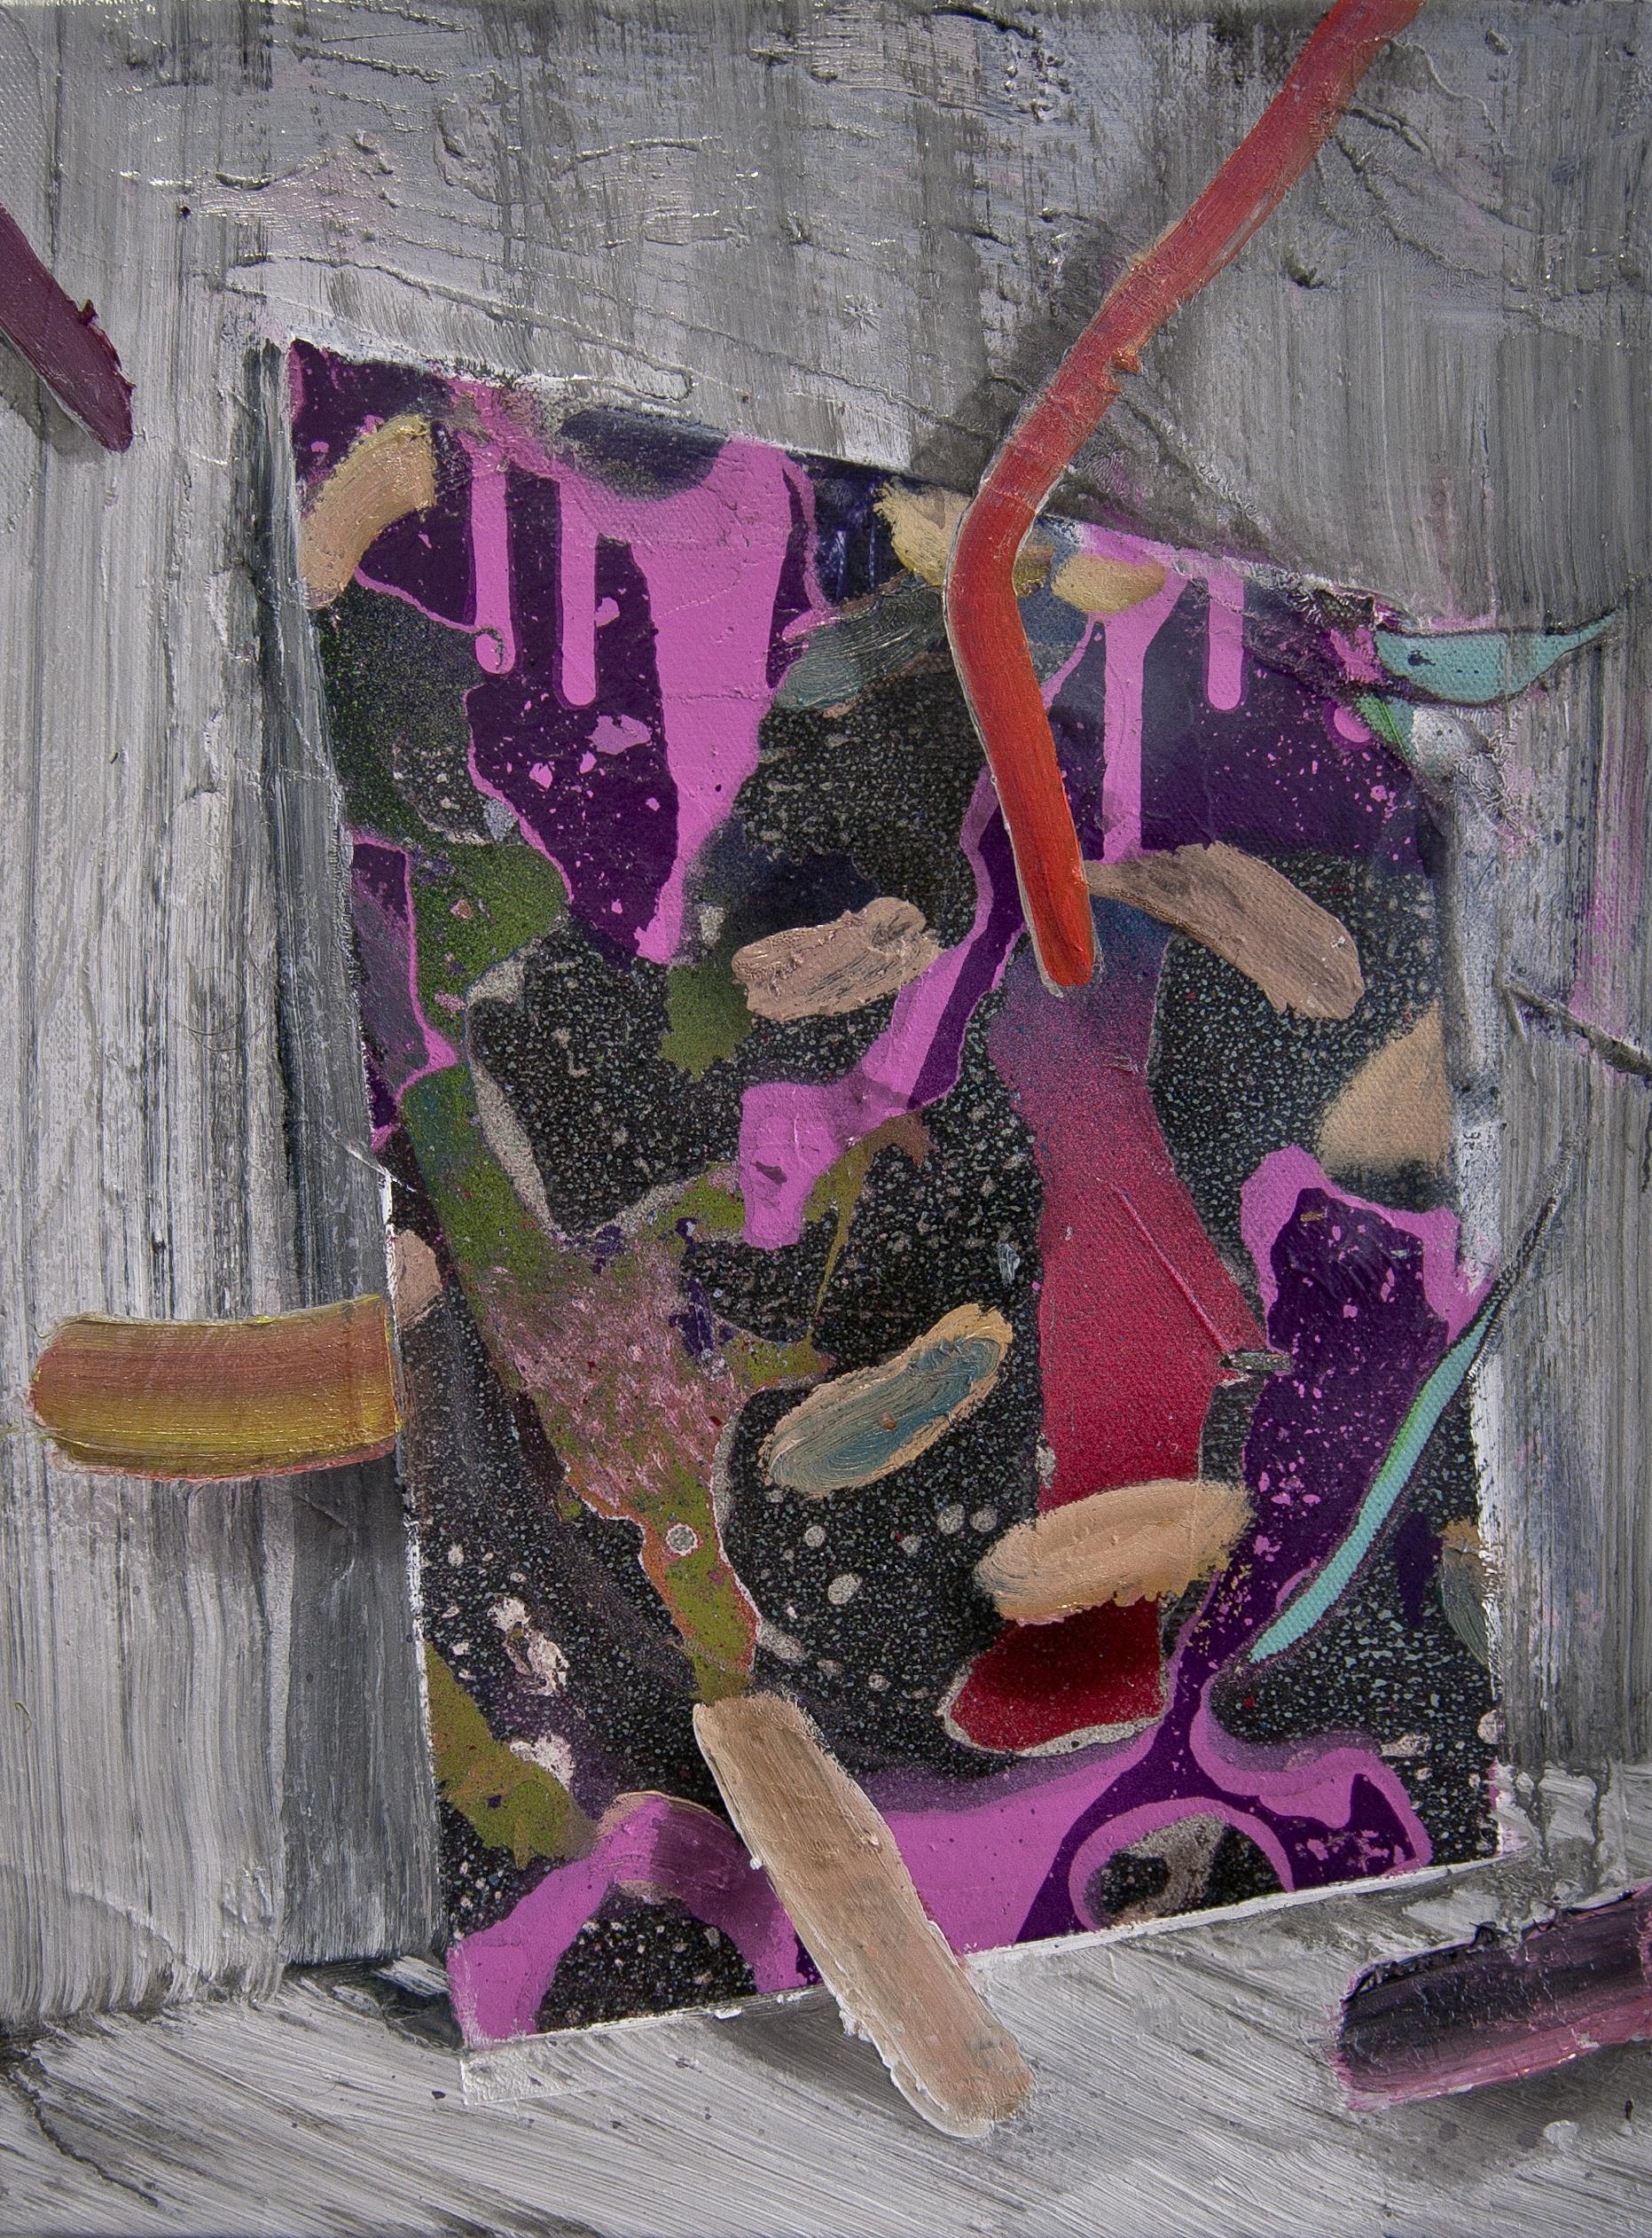 Becker Schmitz | Die Farbfrequenz | 2015, 40 x 30 cm, Öl / Leinwand